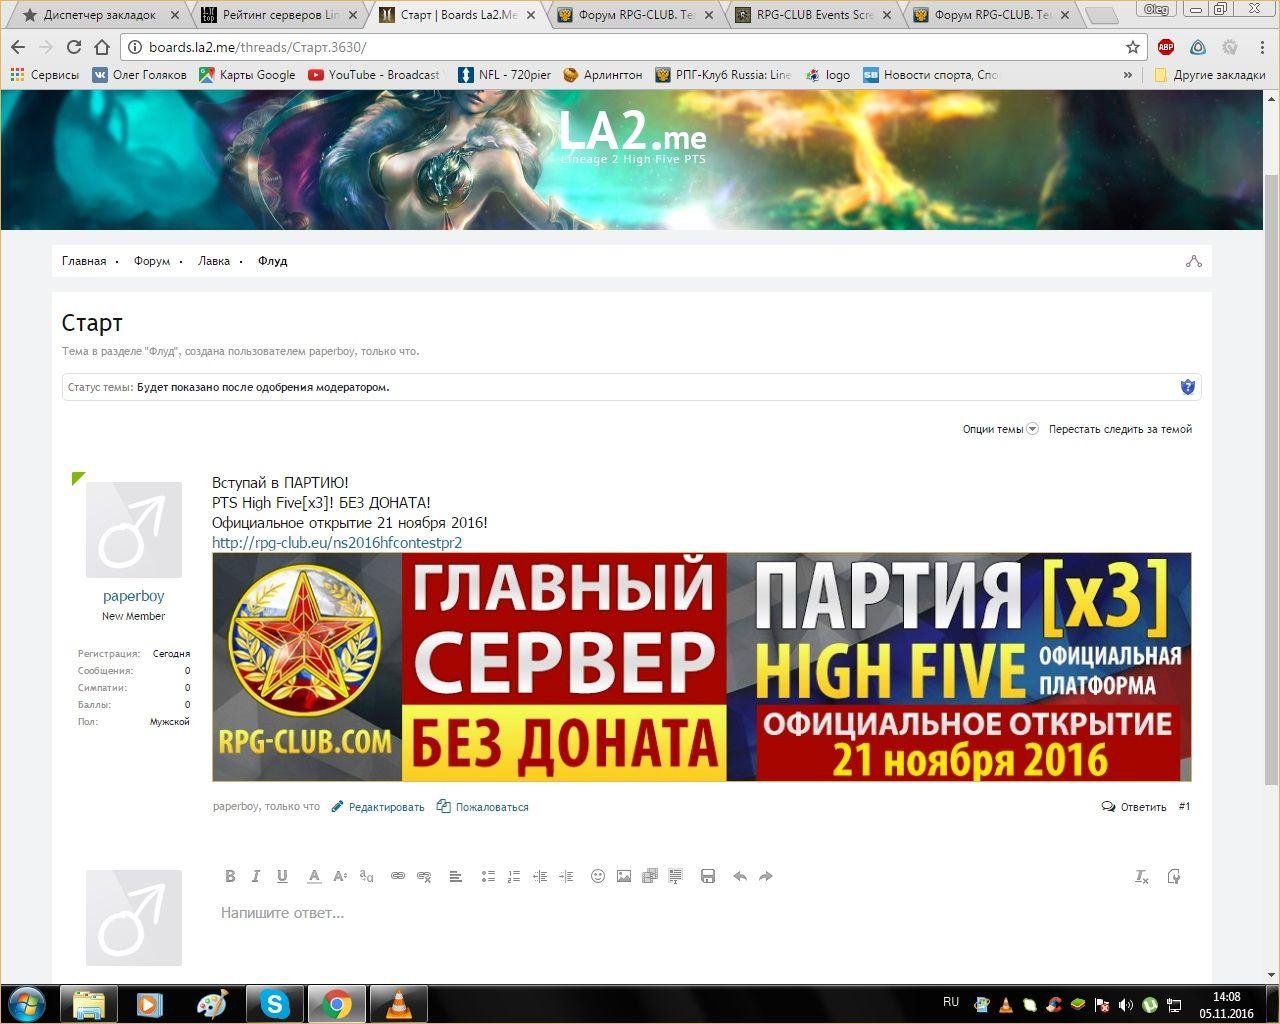 Lineage 2 Screenshot: game 46ю105ю228ю52